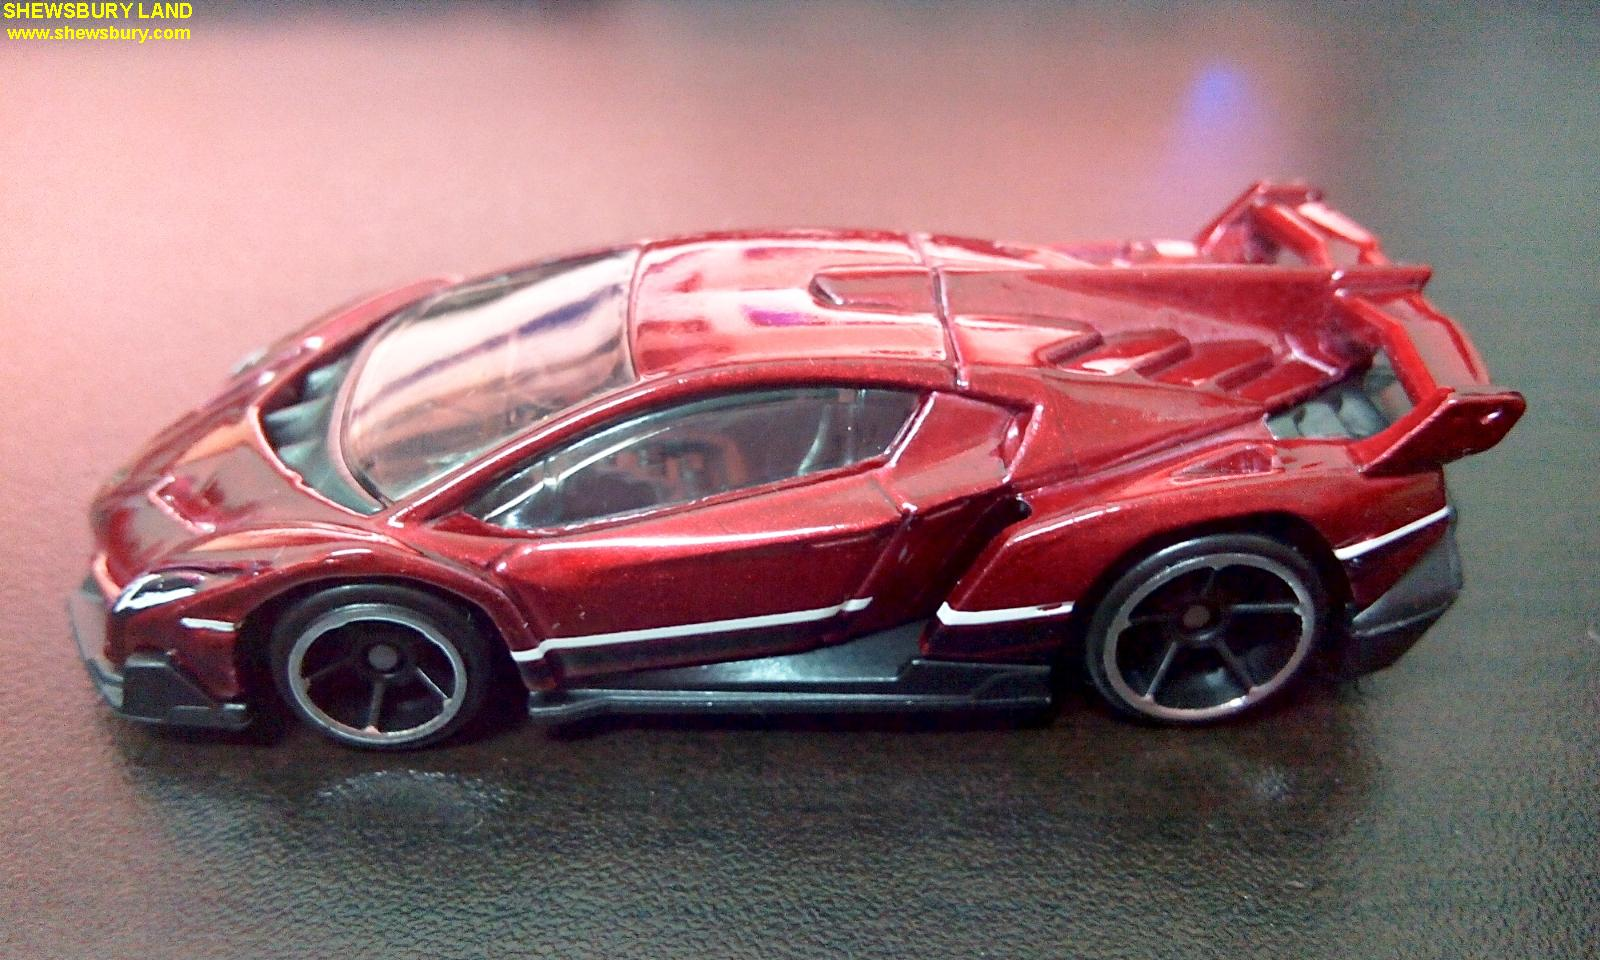 Lamborghini Veneno Hot Wheels Price